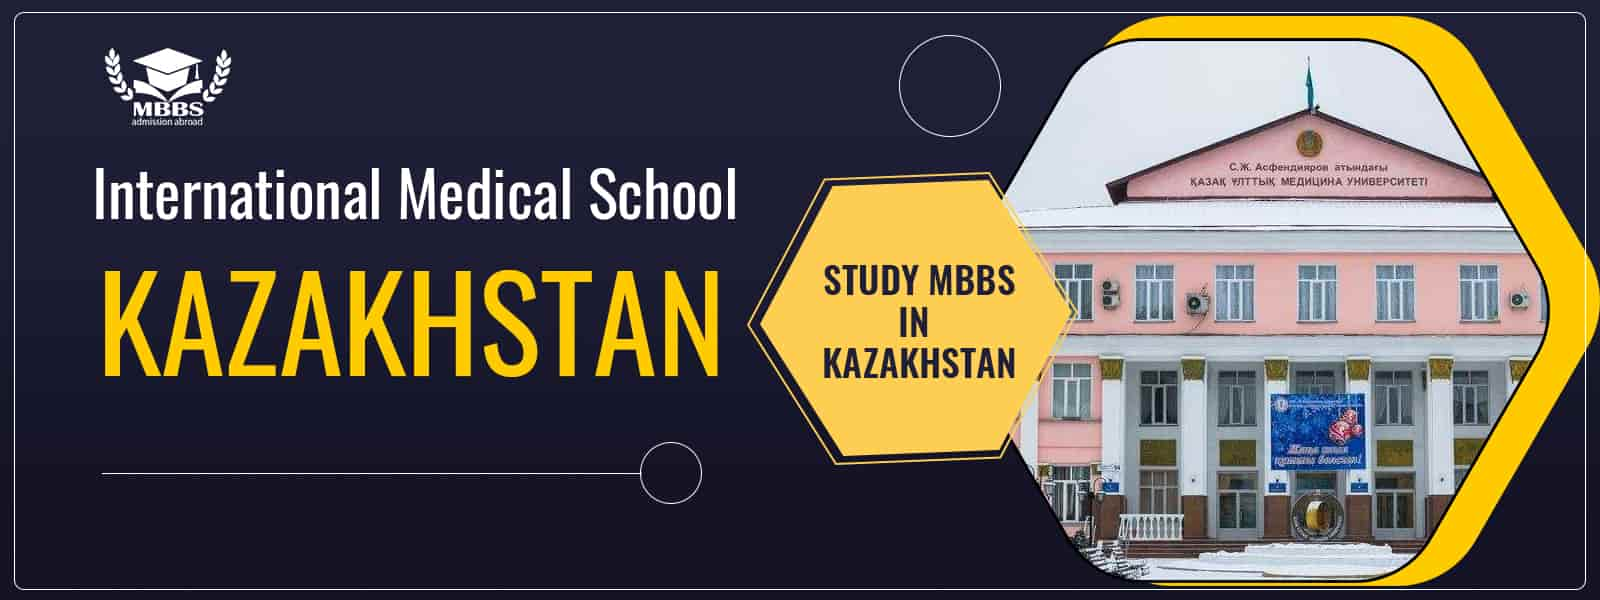 International Medical School | IMS Kazakhstan